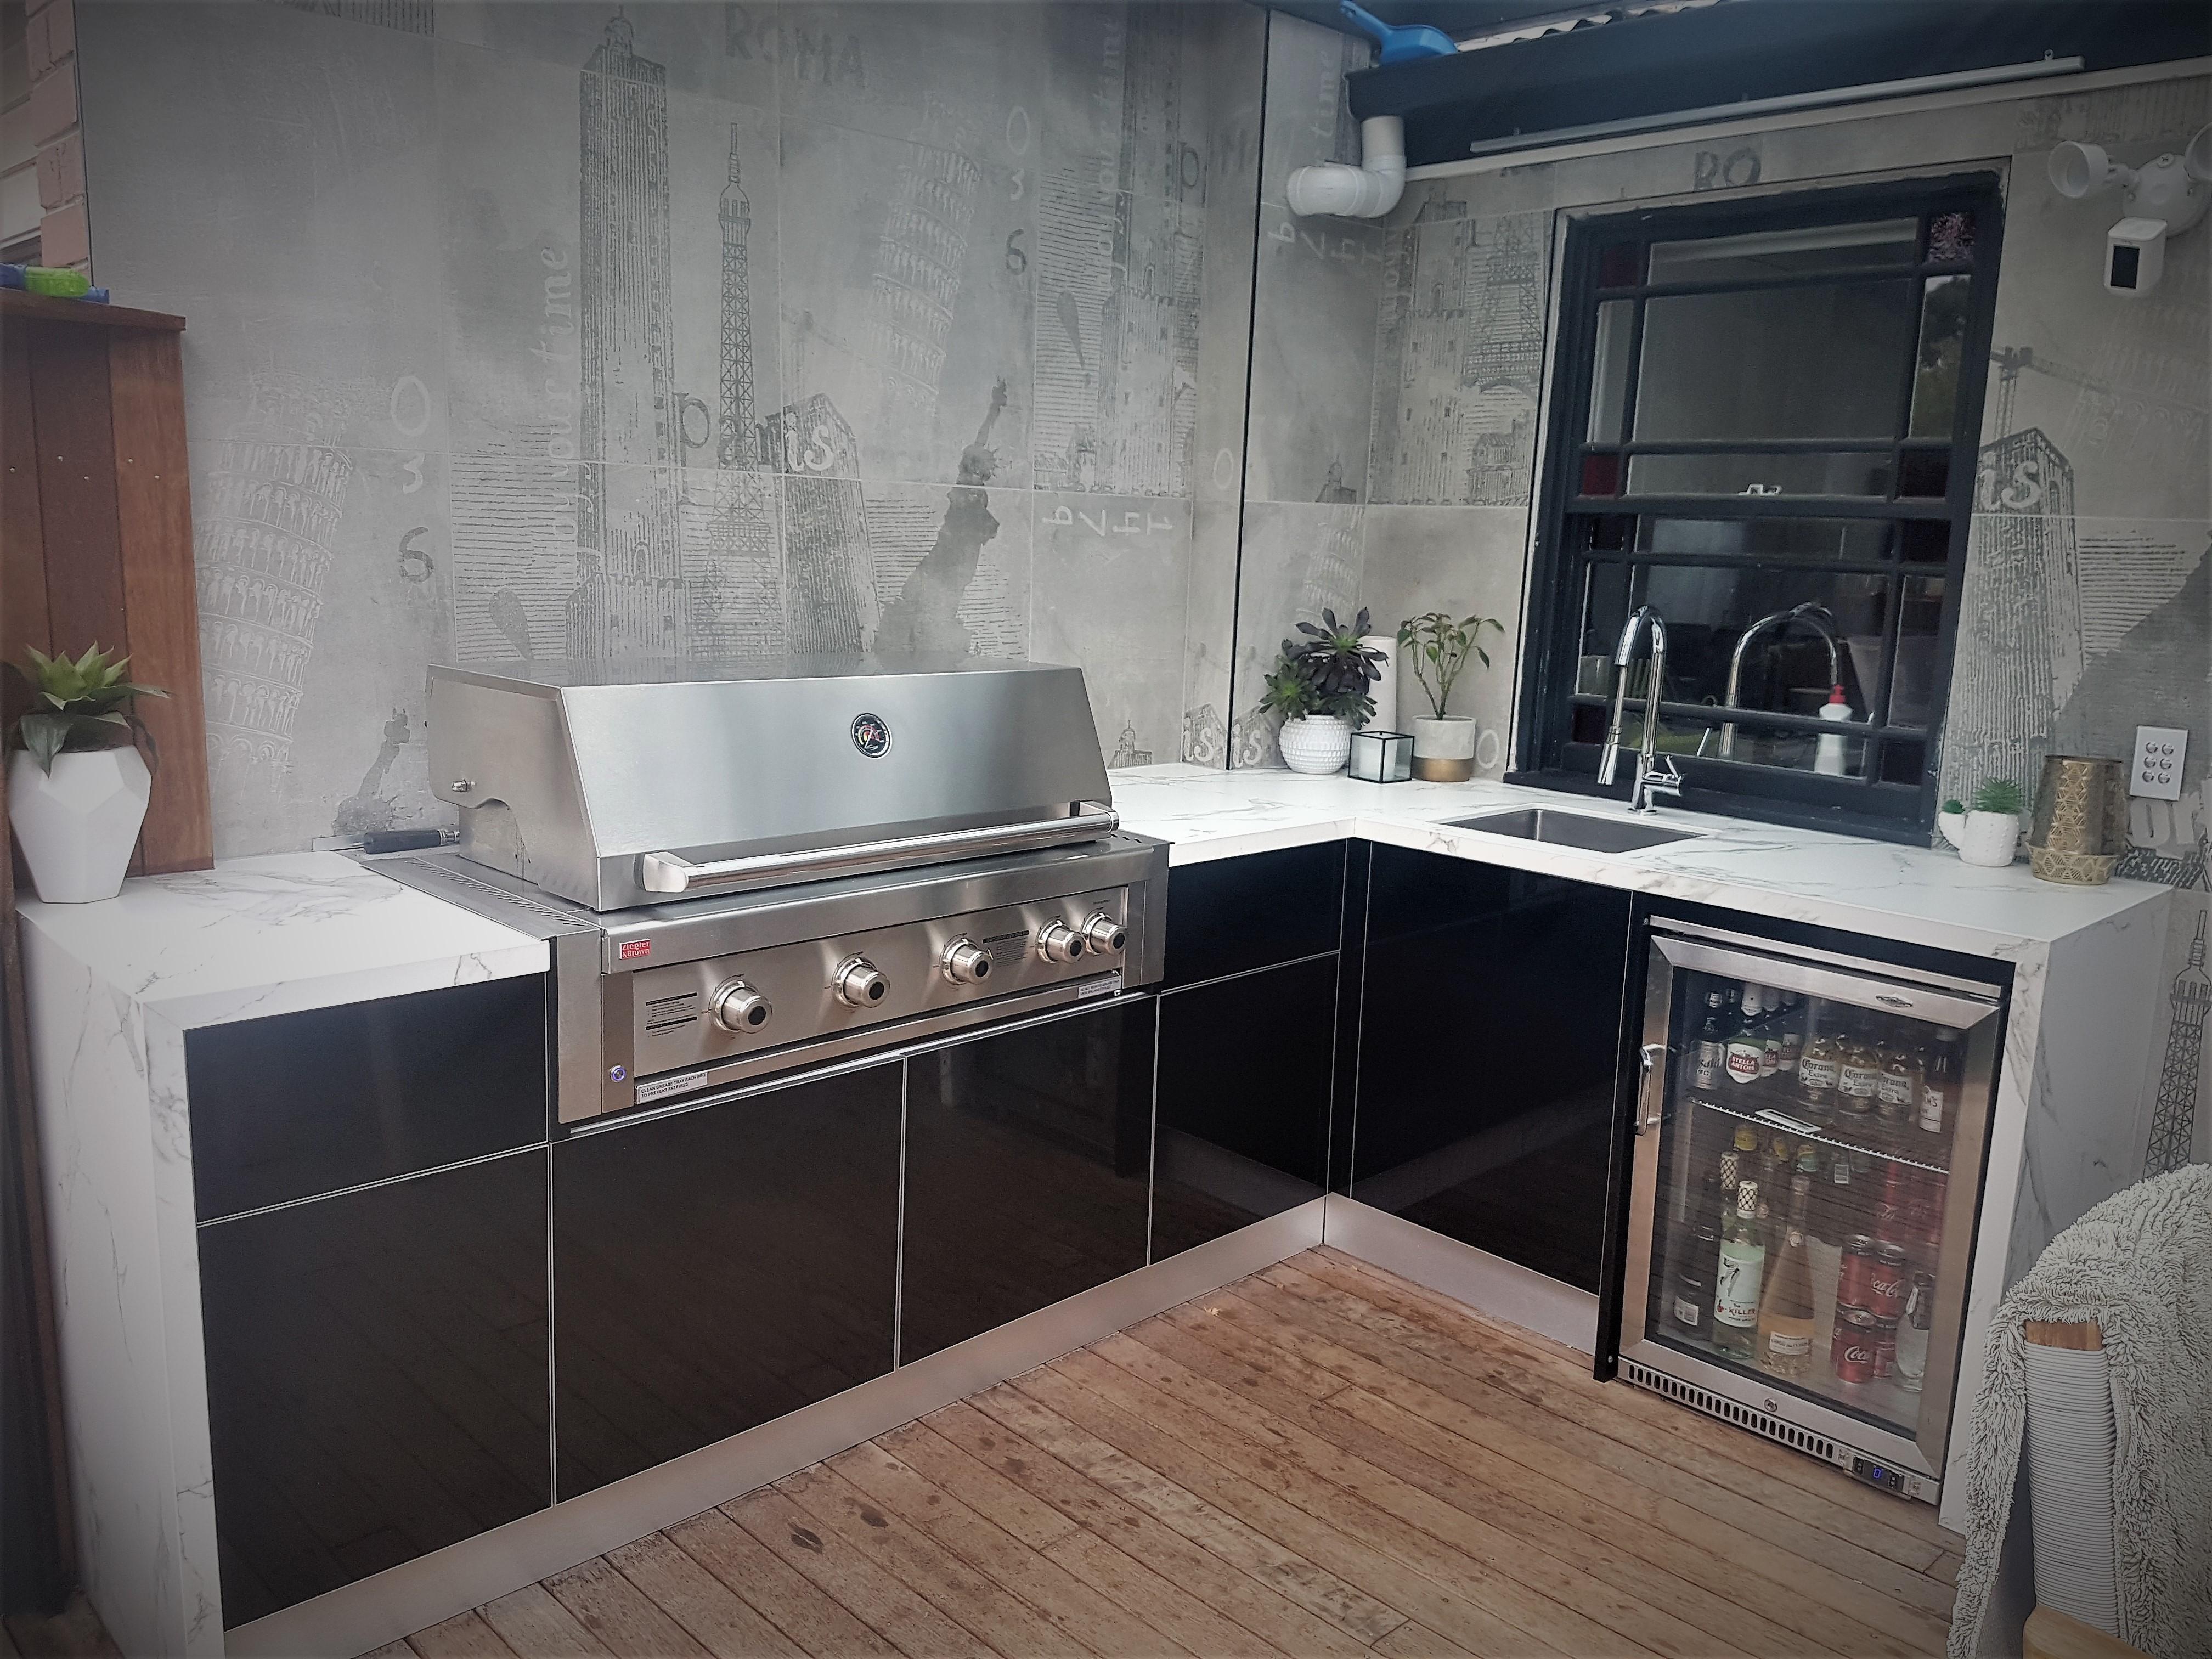 Ziegler and Brown Grand Turbo 4 Gloss Black Dekton Aura Outdoor Kitchen 299-1